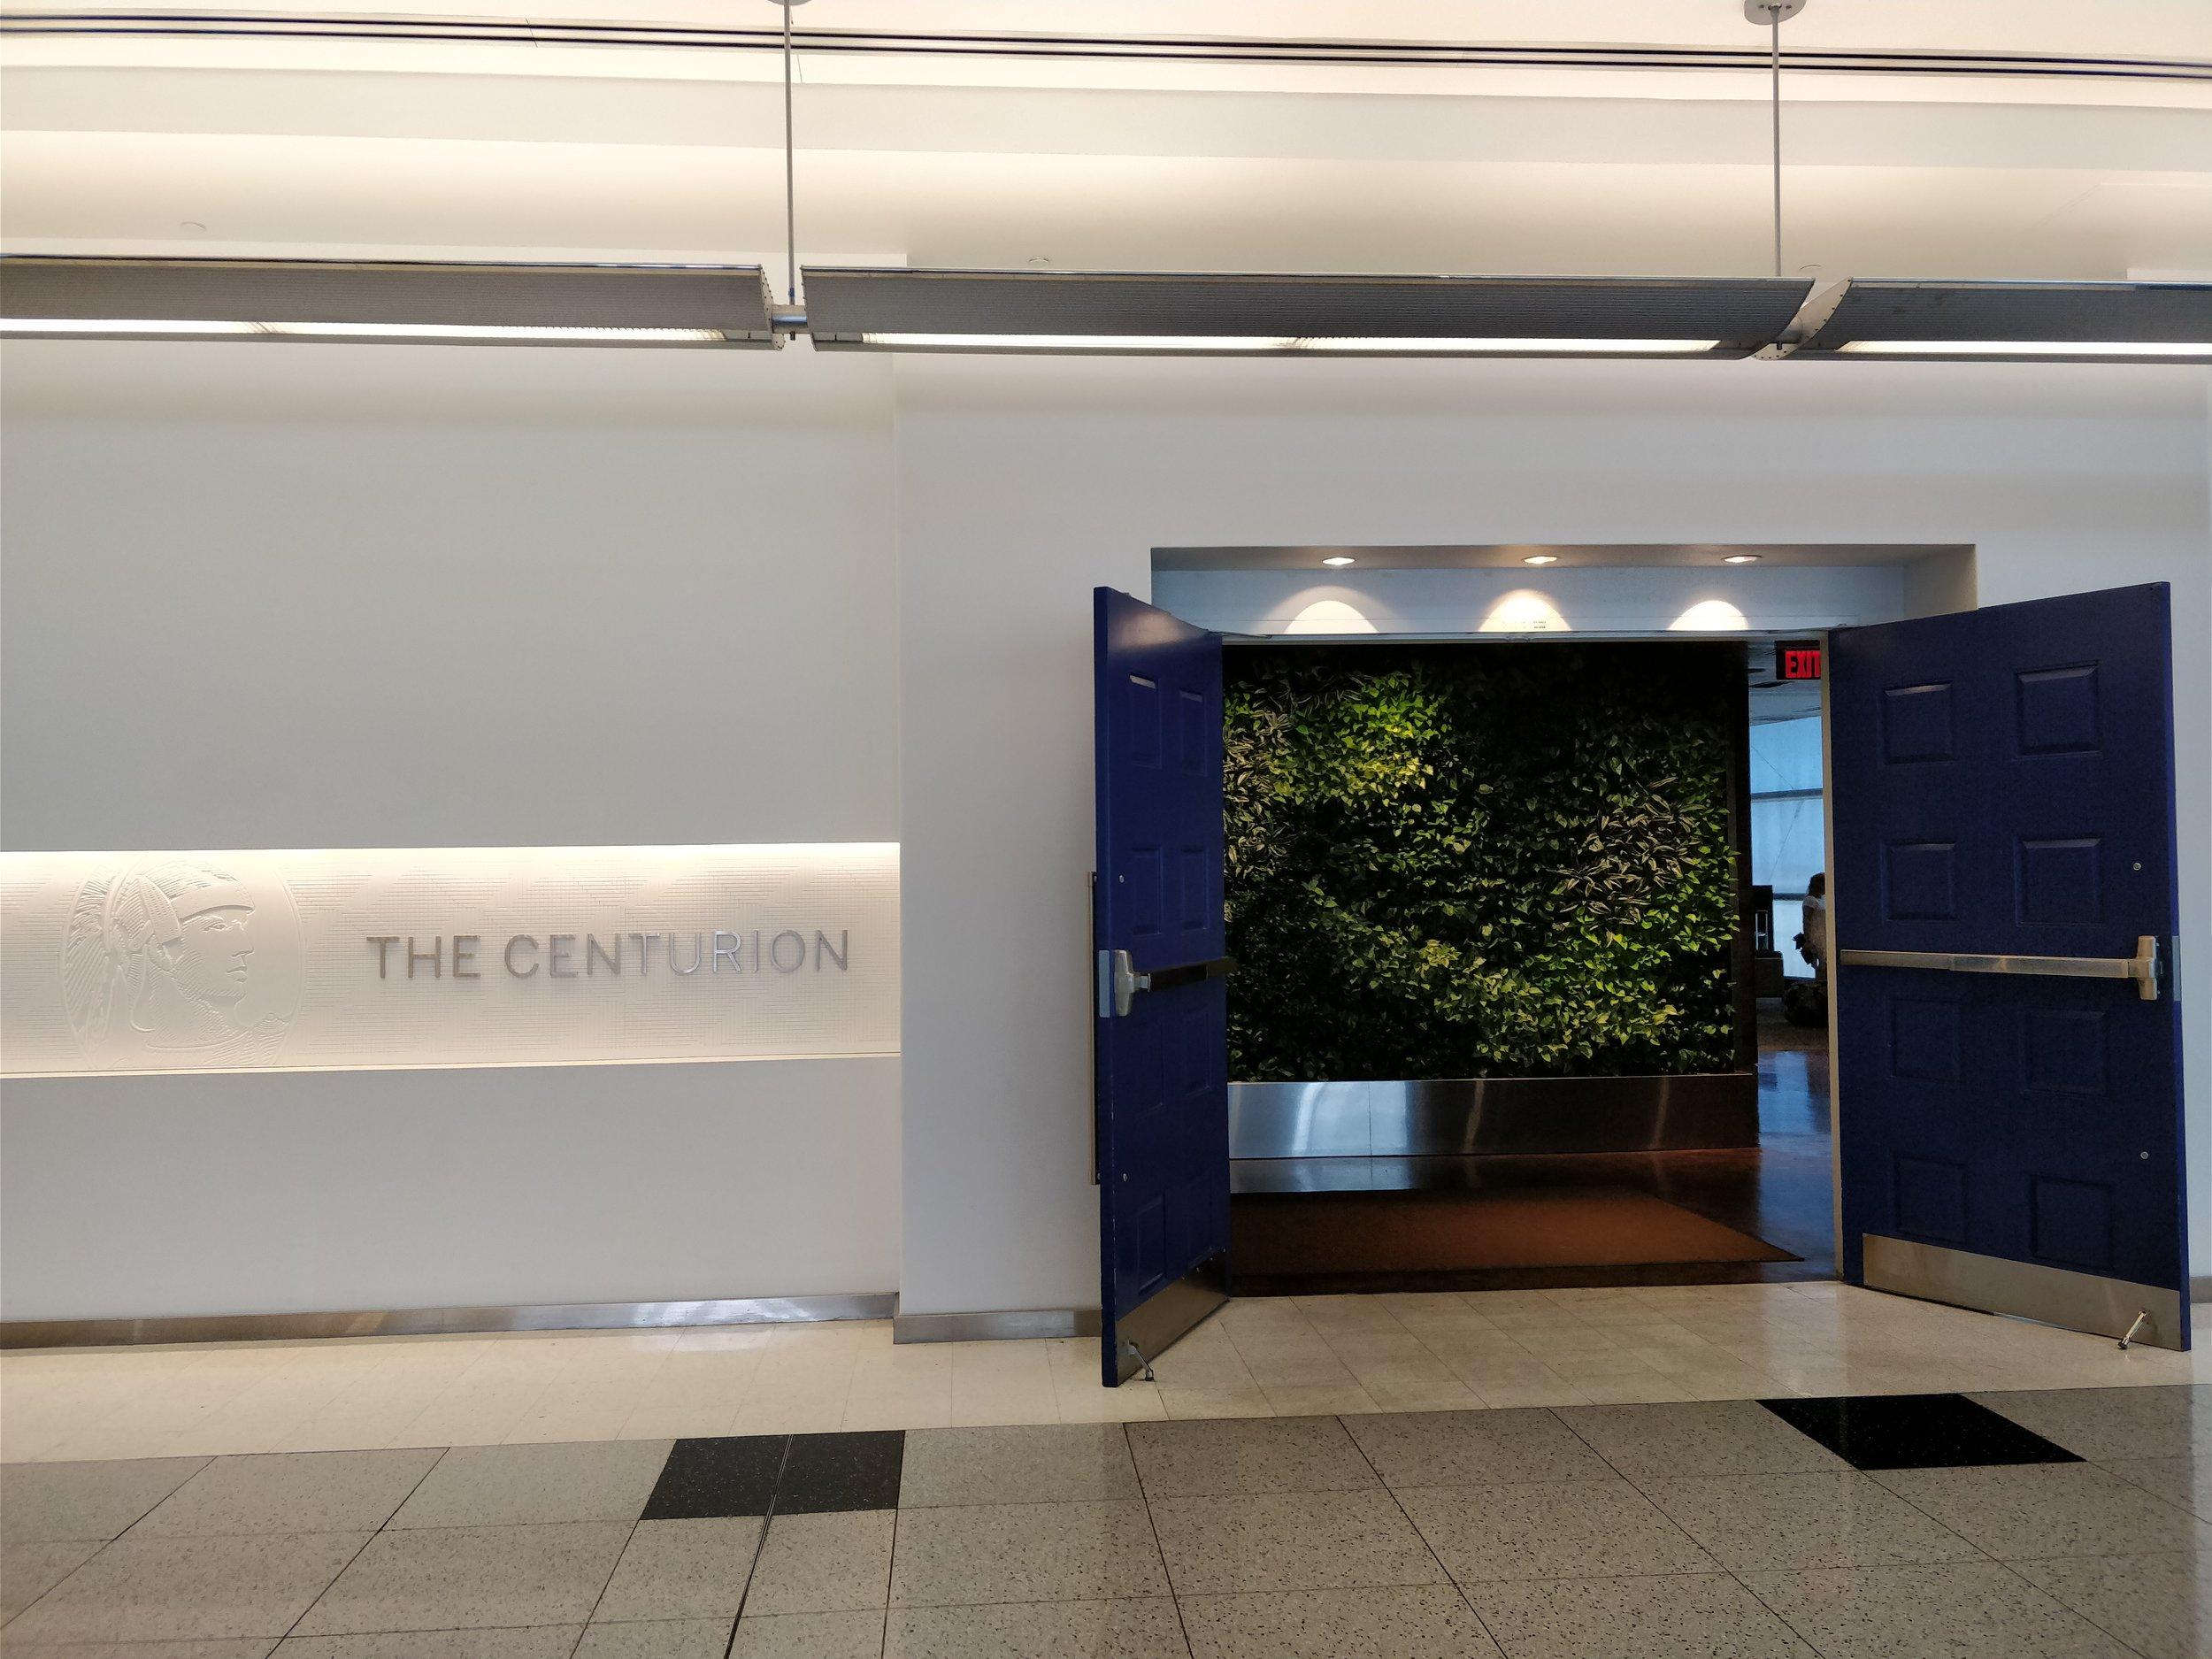 Entrance to the las vegas centurion lounge